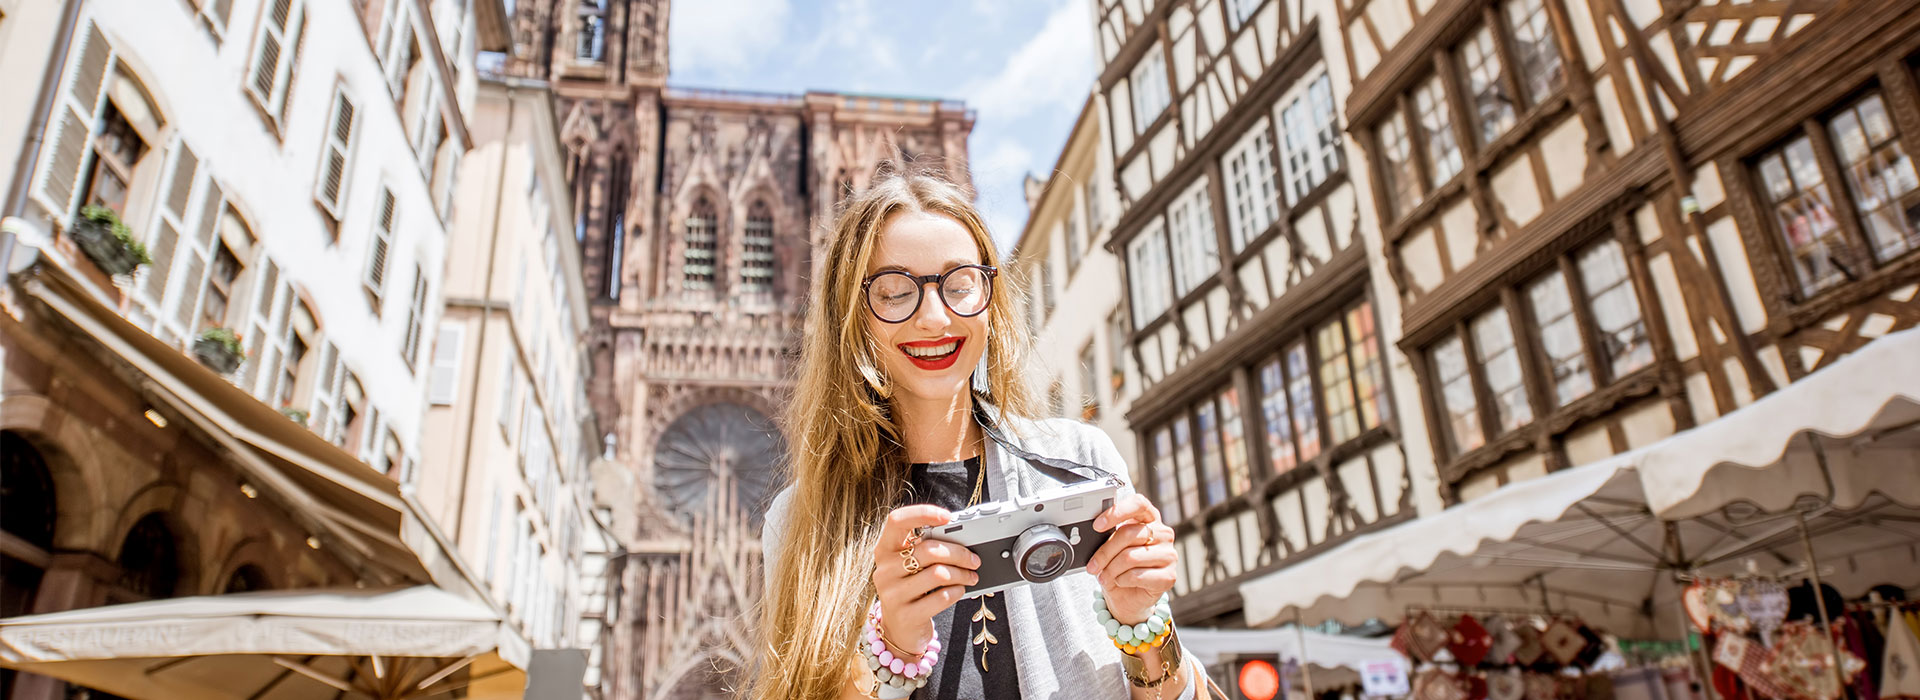 Alsace,Voyage, Agence de Voyages, Agence Réceptive, Lisela, Grand Est, Week-end